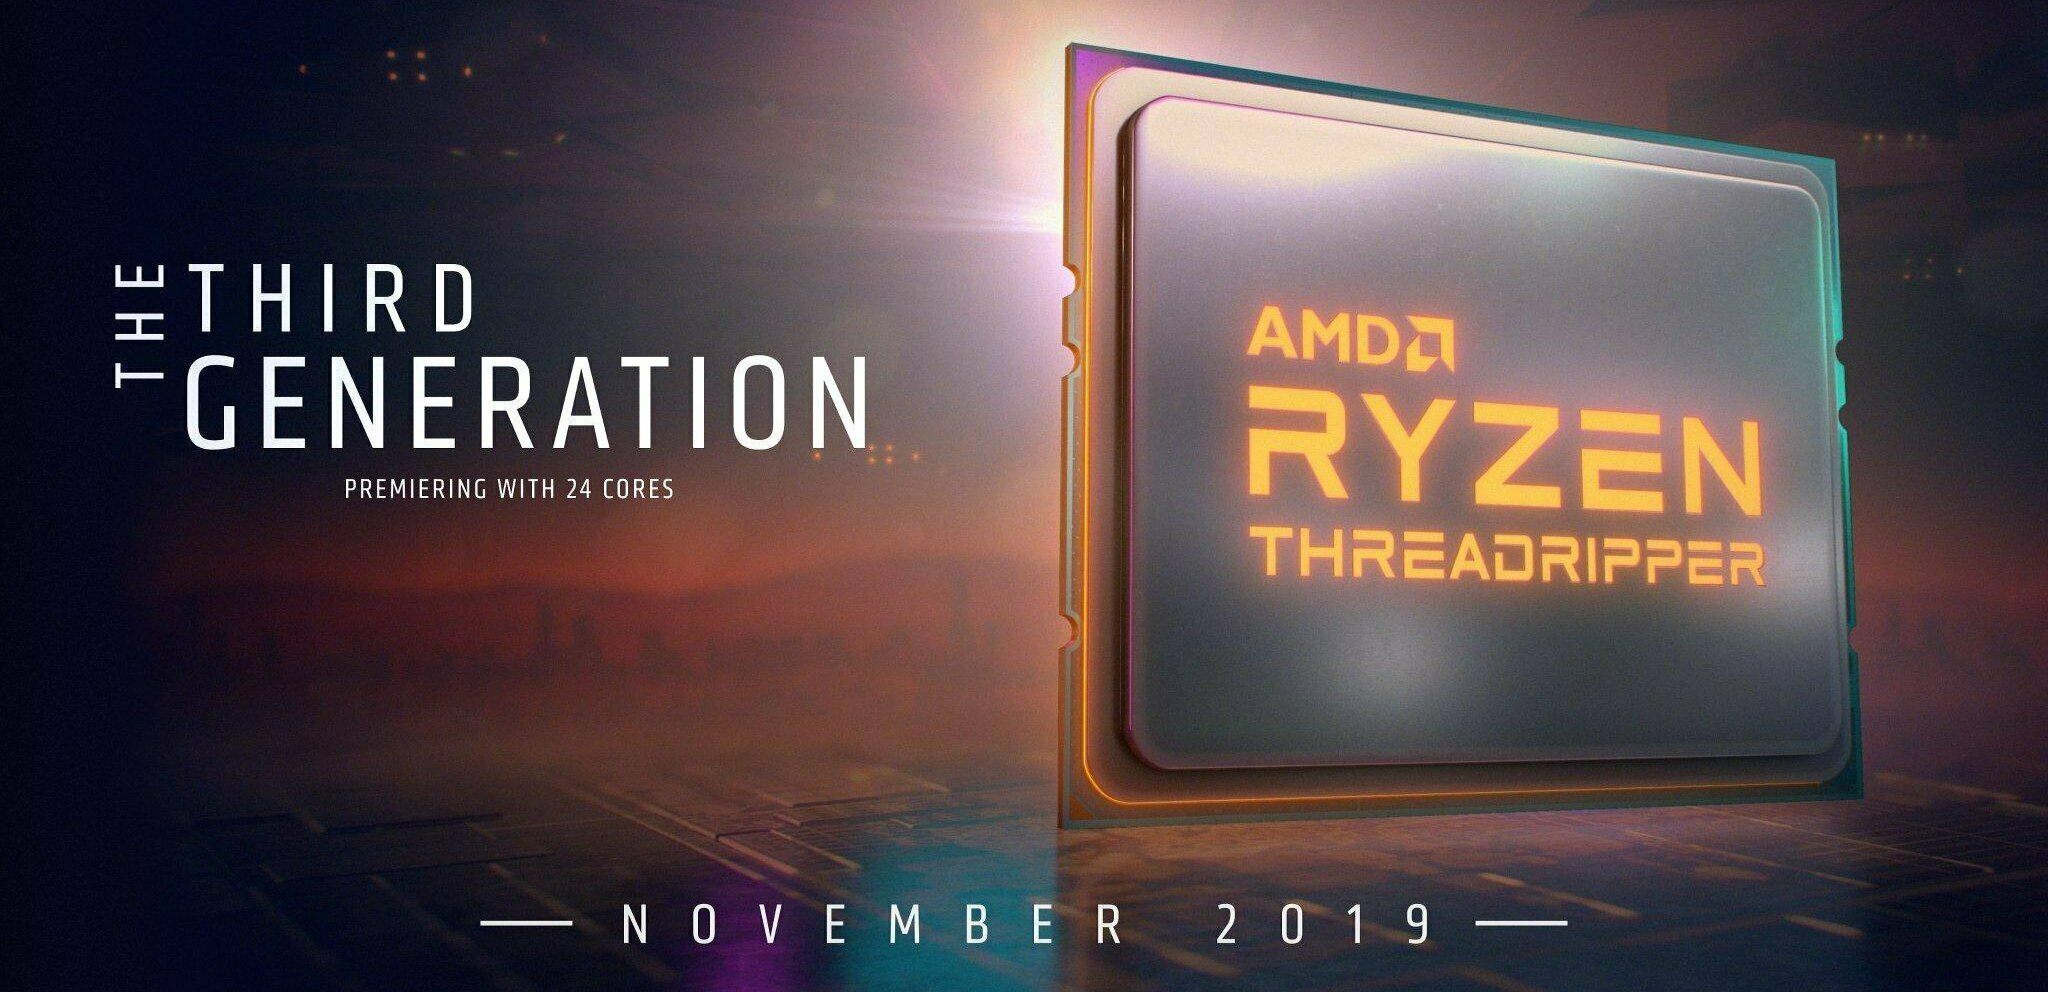 Ryzen Threadripper 3990X : comme prévu, AMD annonce son CPU à 64 cœurs (sans tarif)